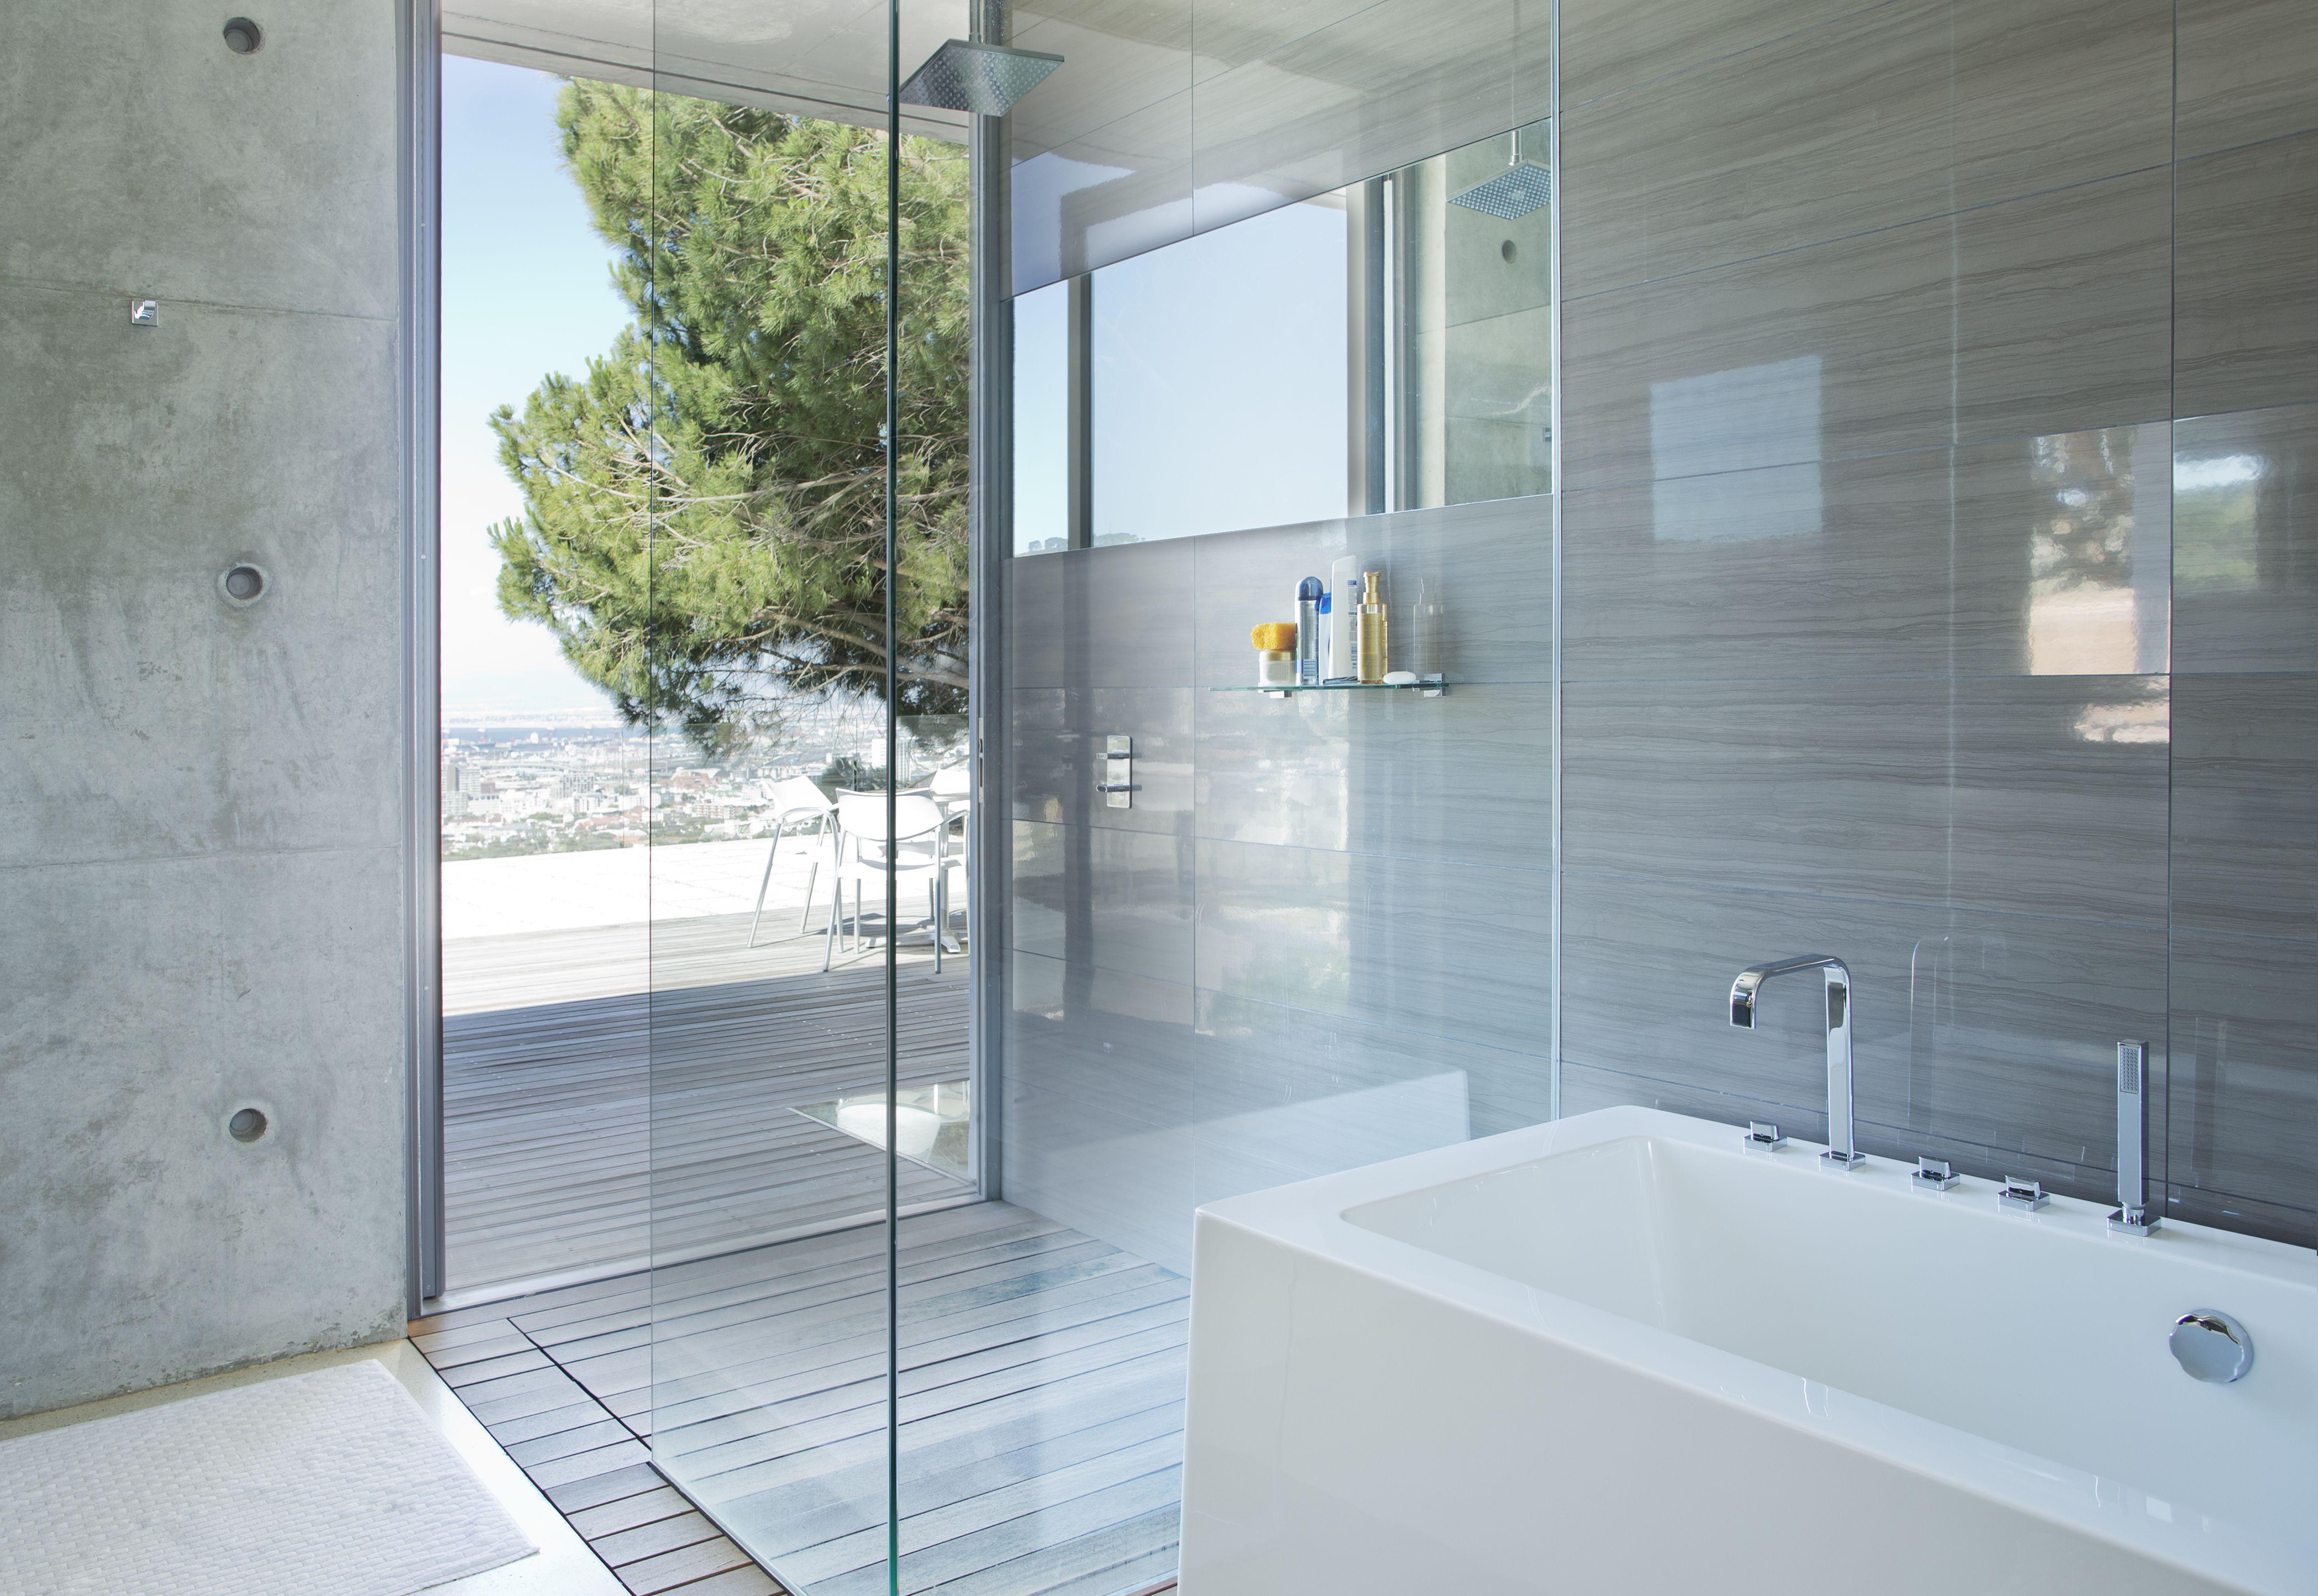 19 Beautiful Shower Designs